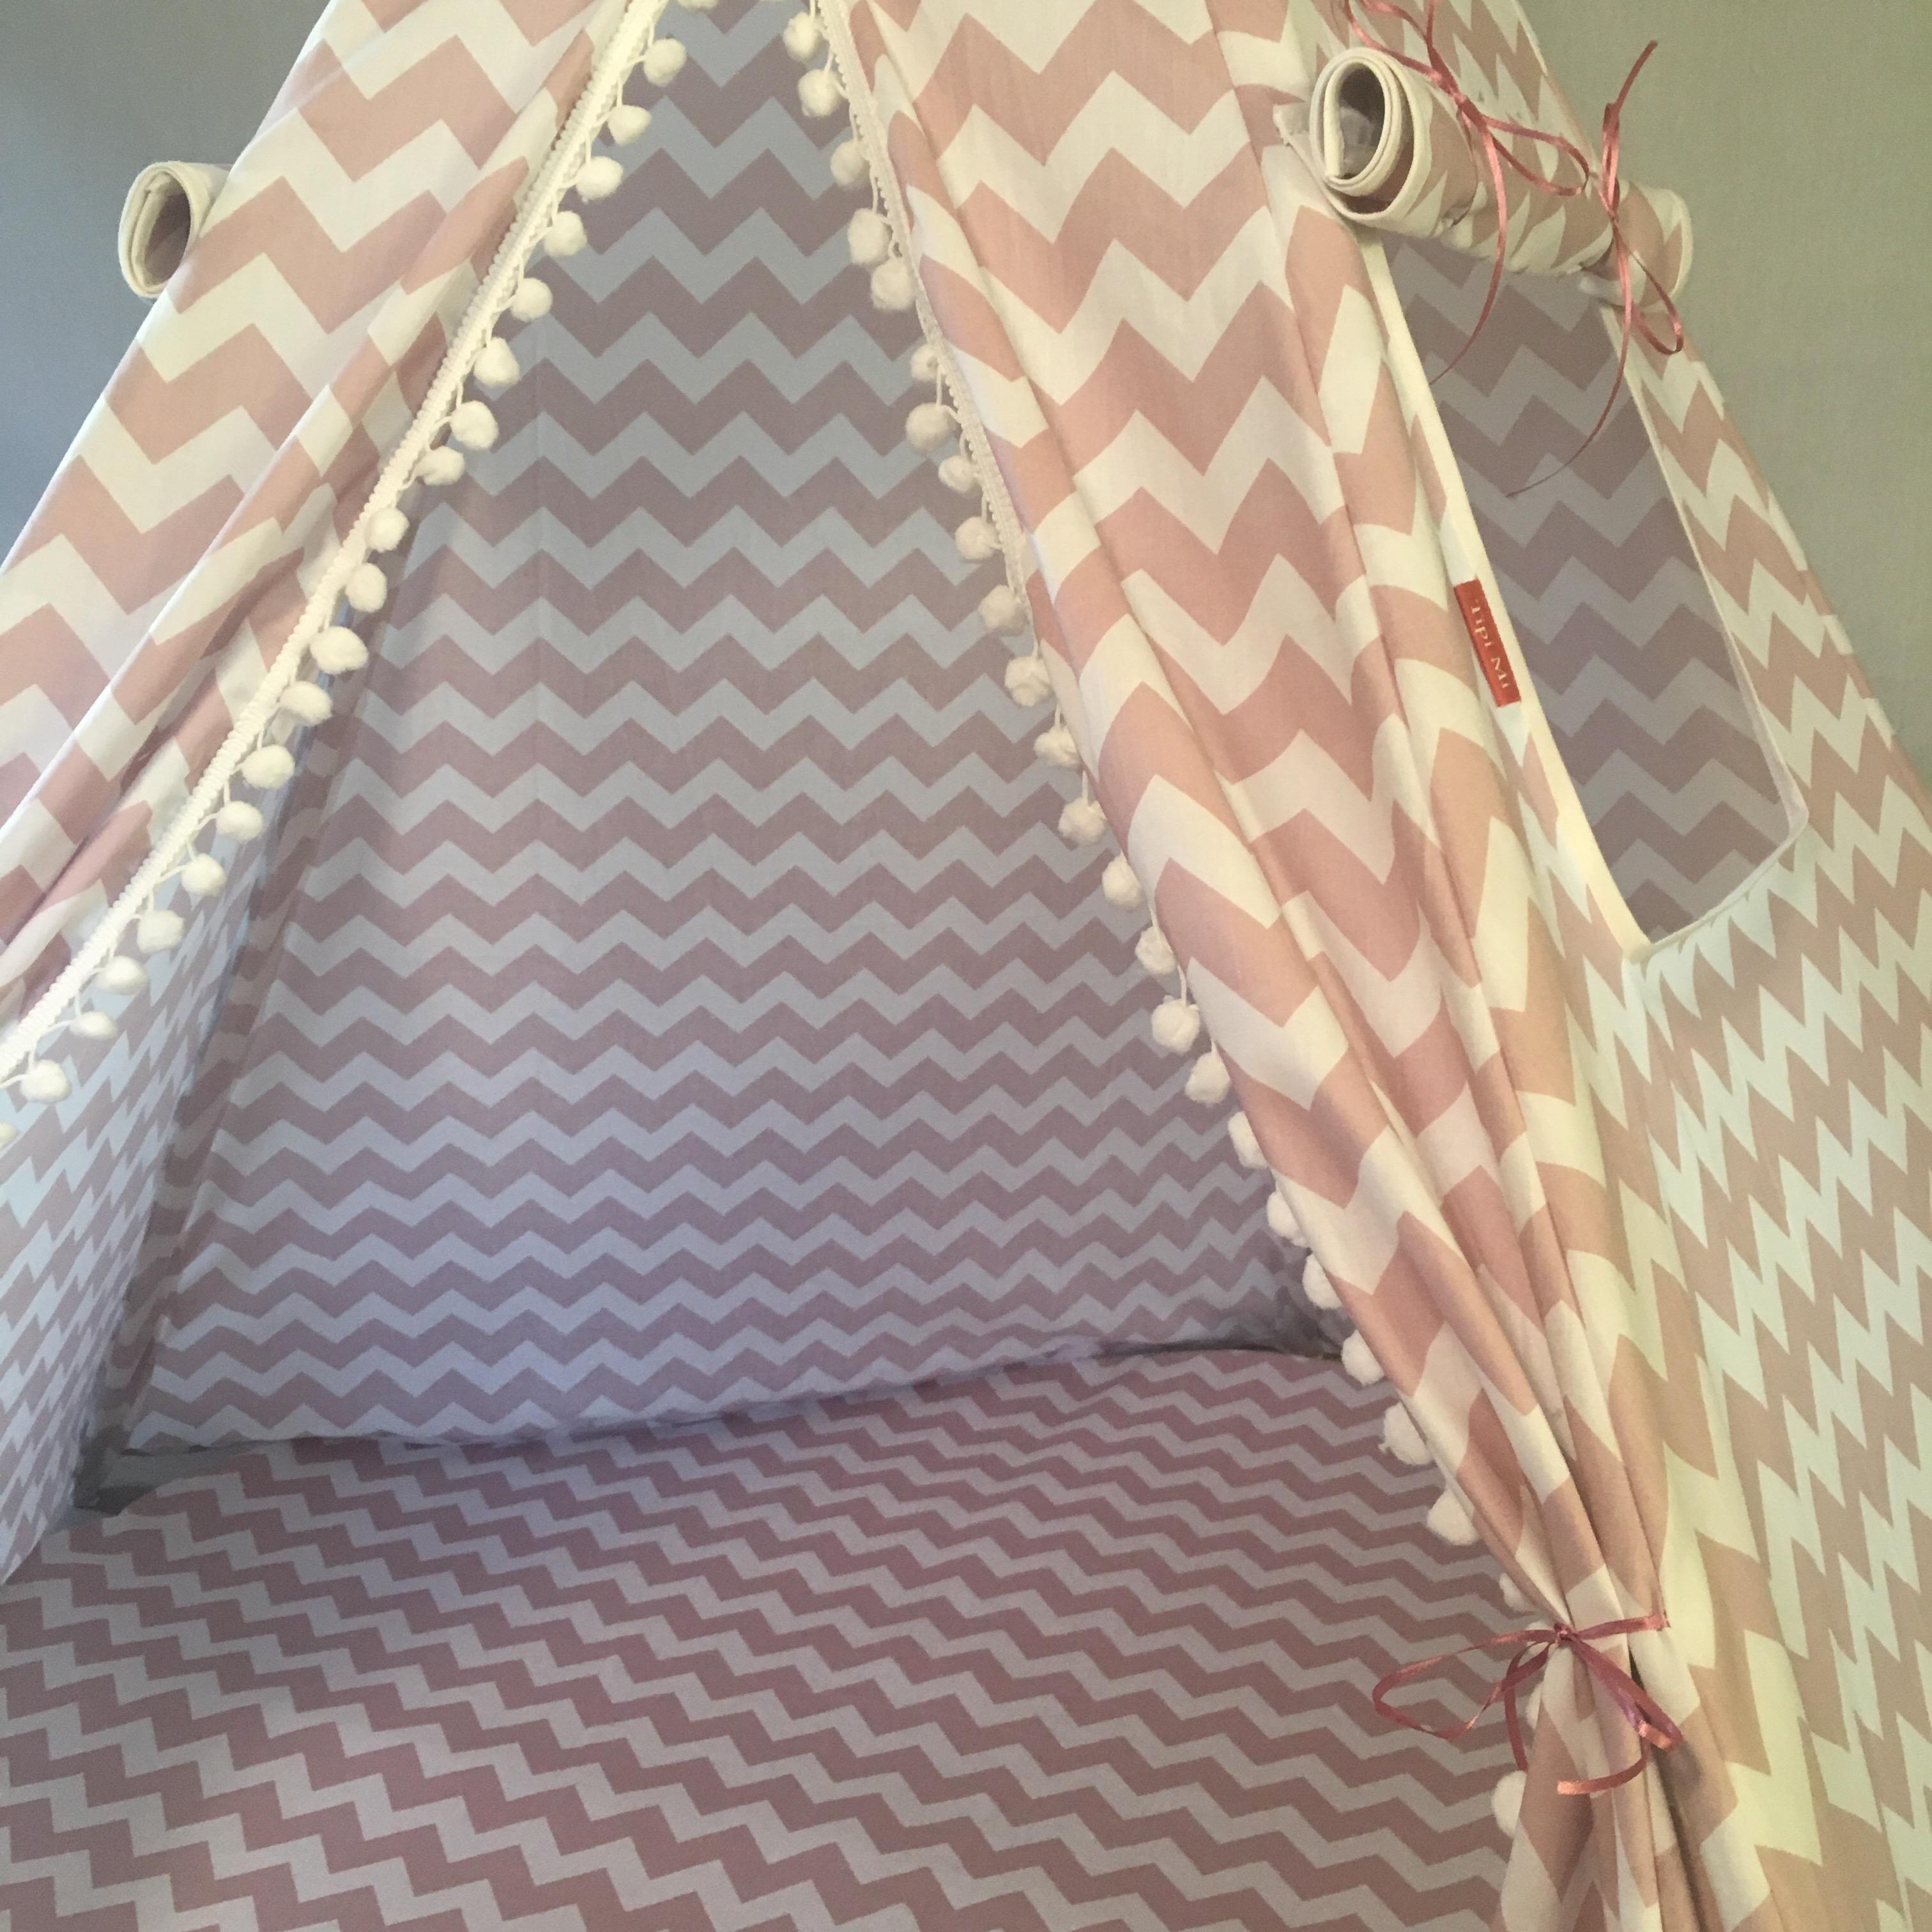 Bedwelming Tipi tent zigzag oud roze - Tipi Mi #CE97